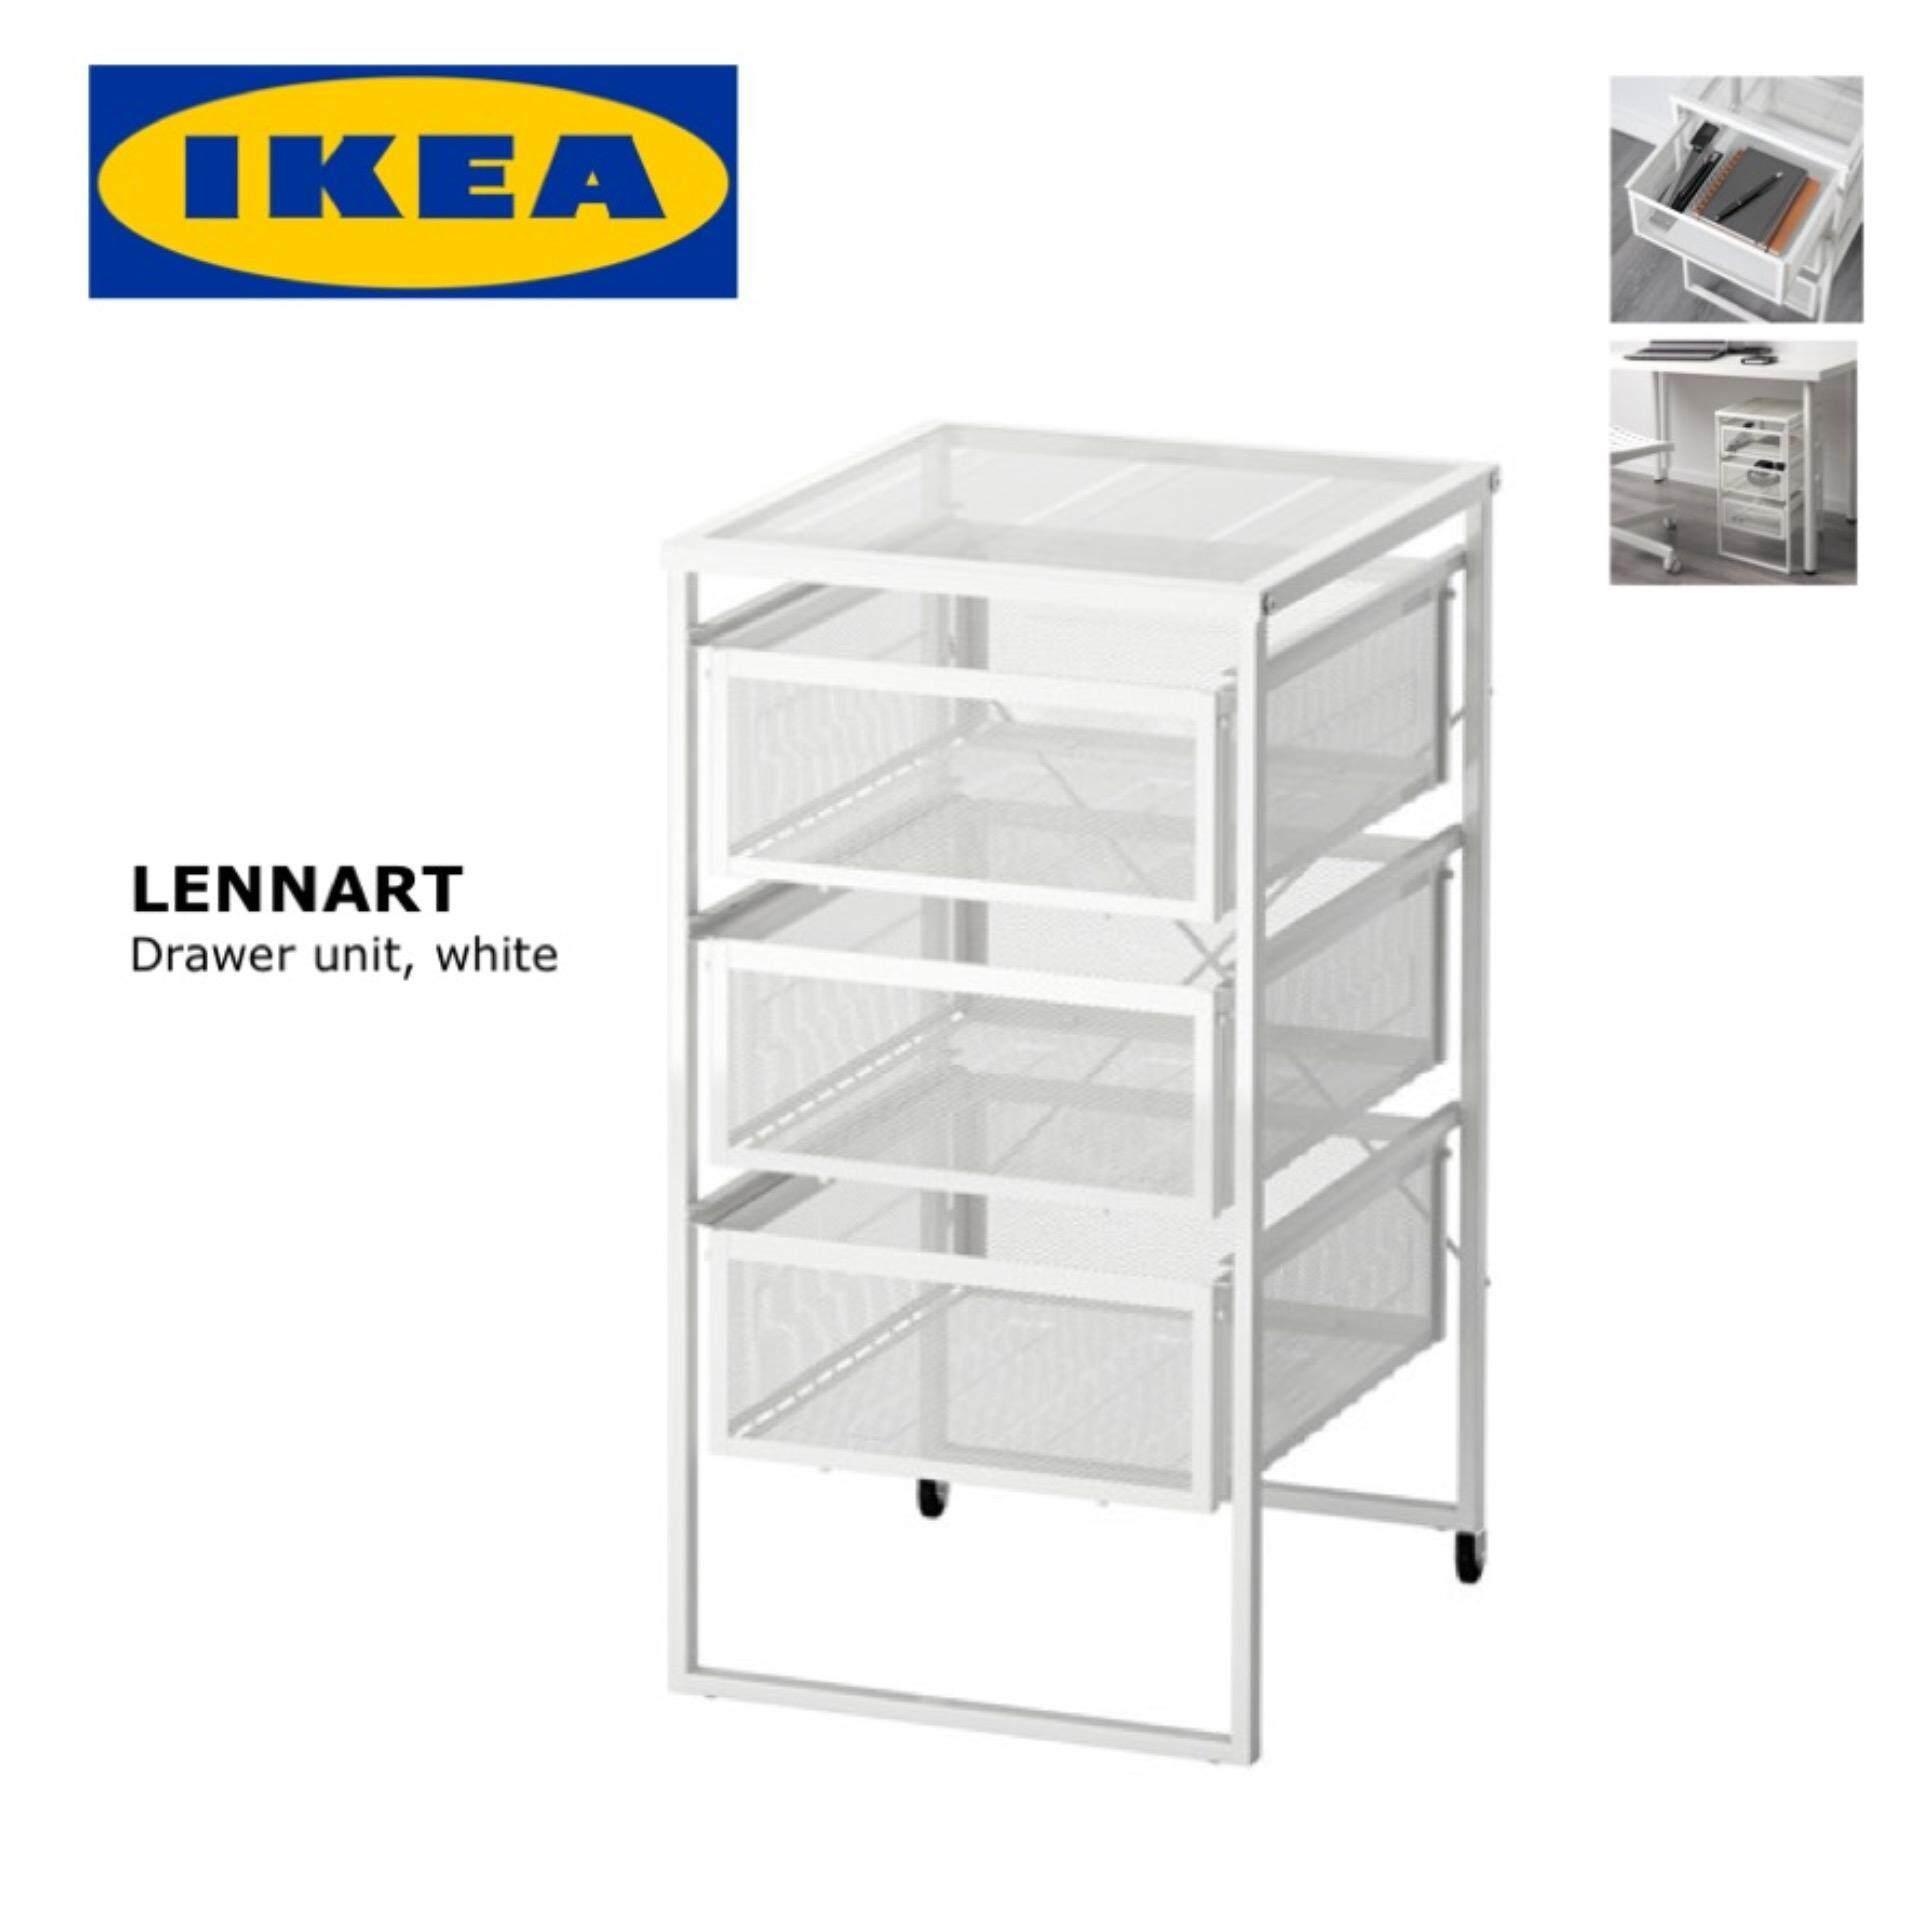 IKEA LENNART Office Drawer Unit, (white), 30x34x56cm | Lazada Malaysia